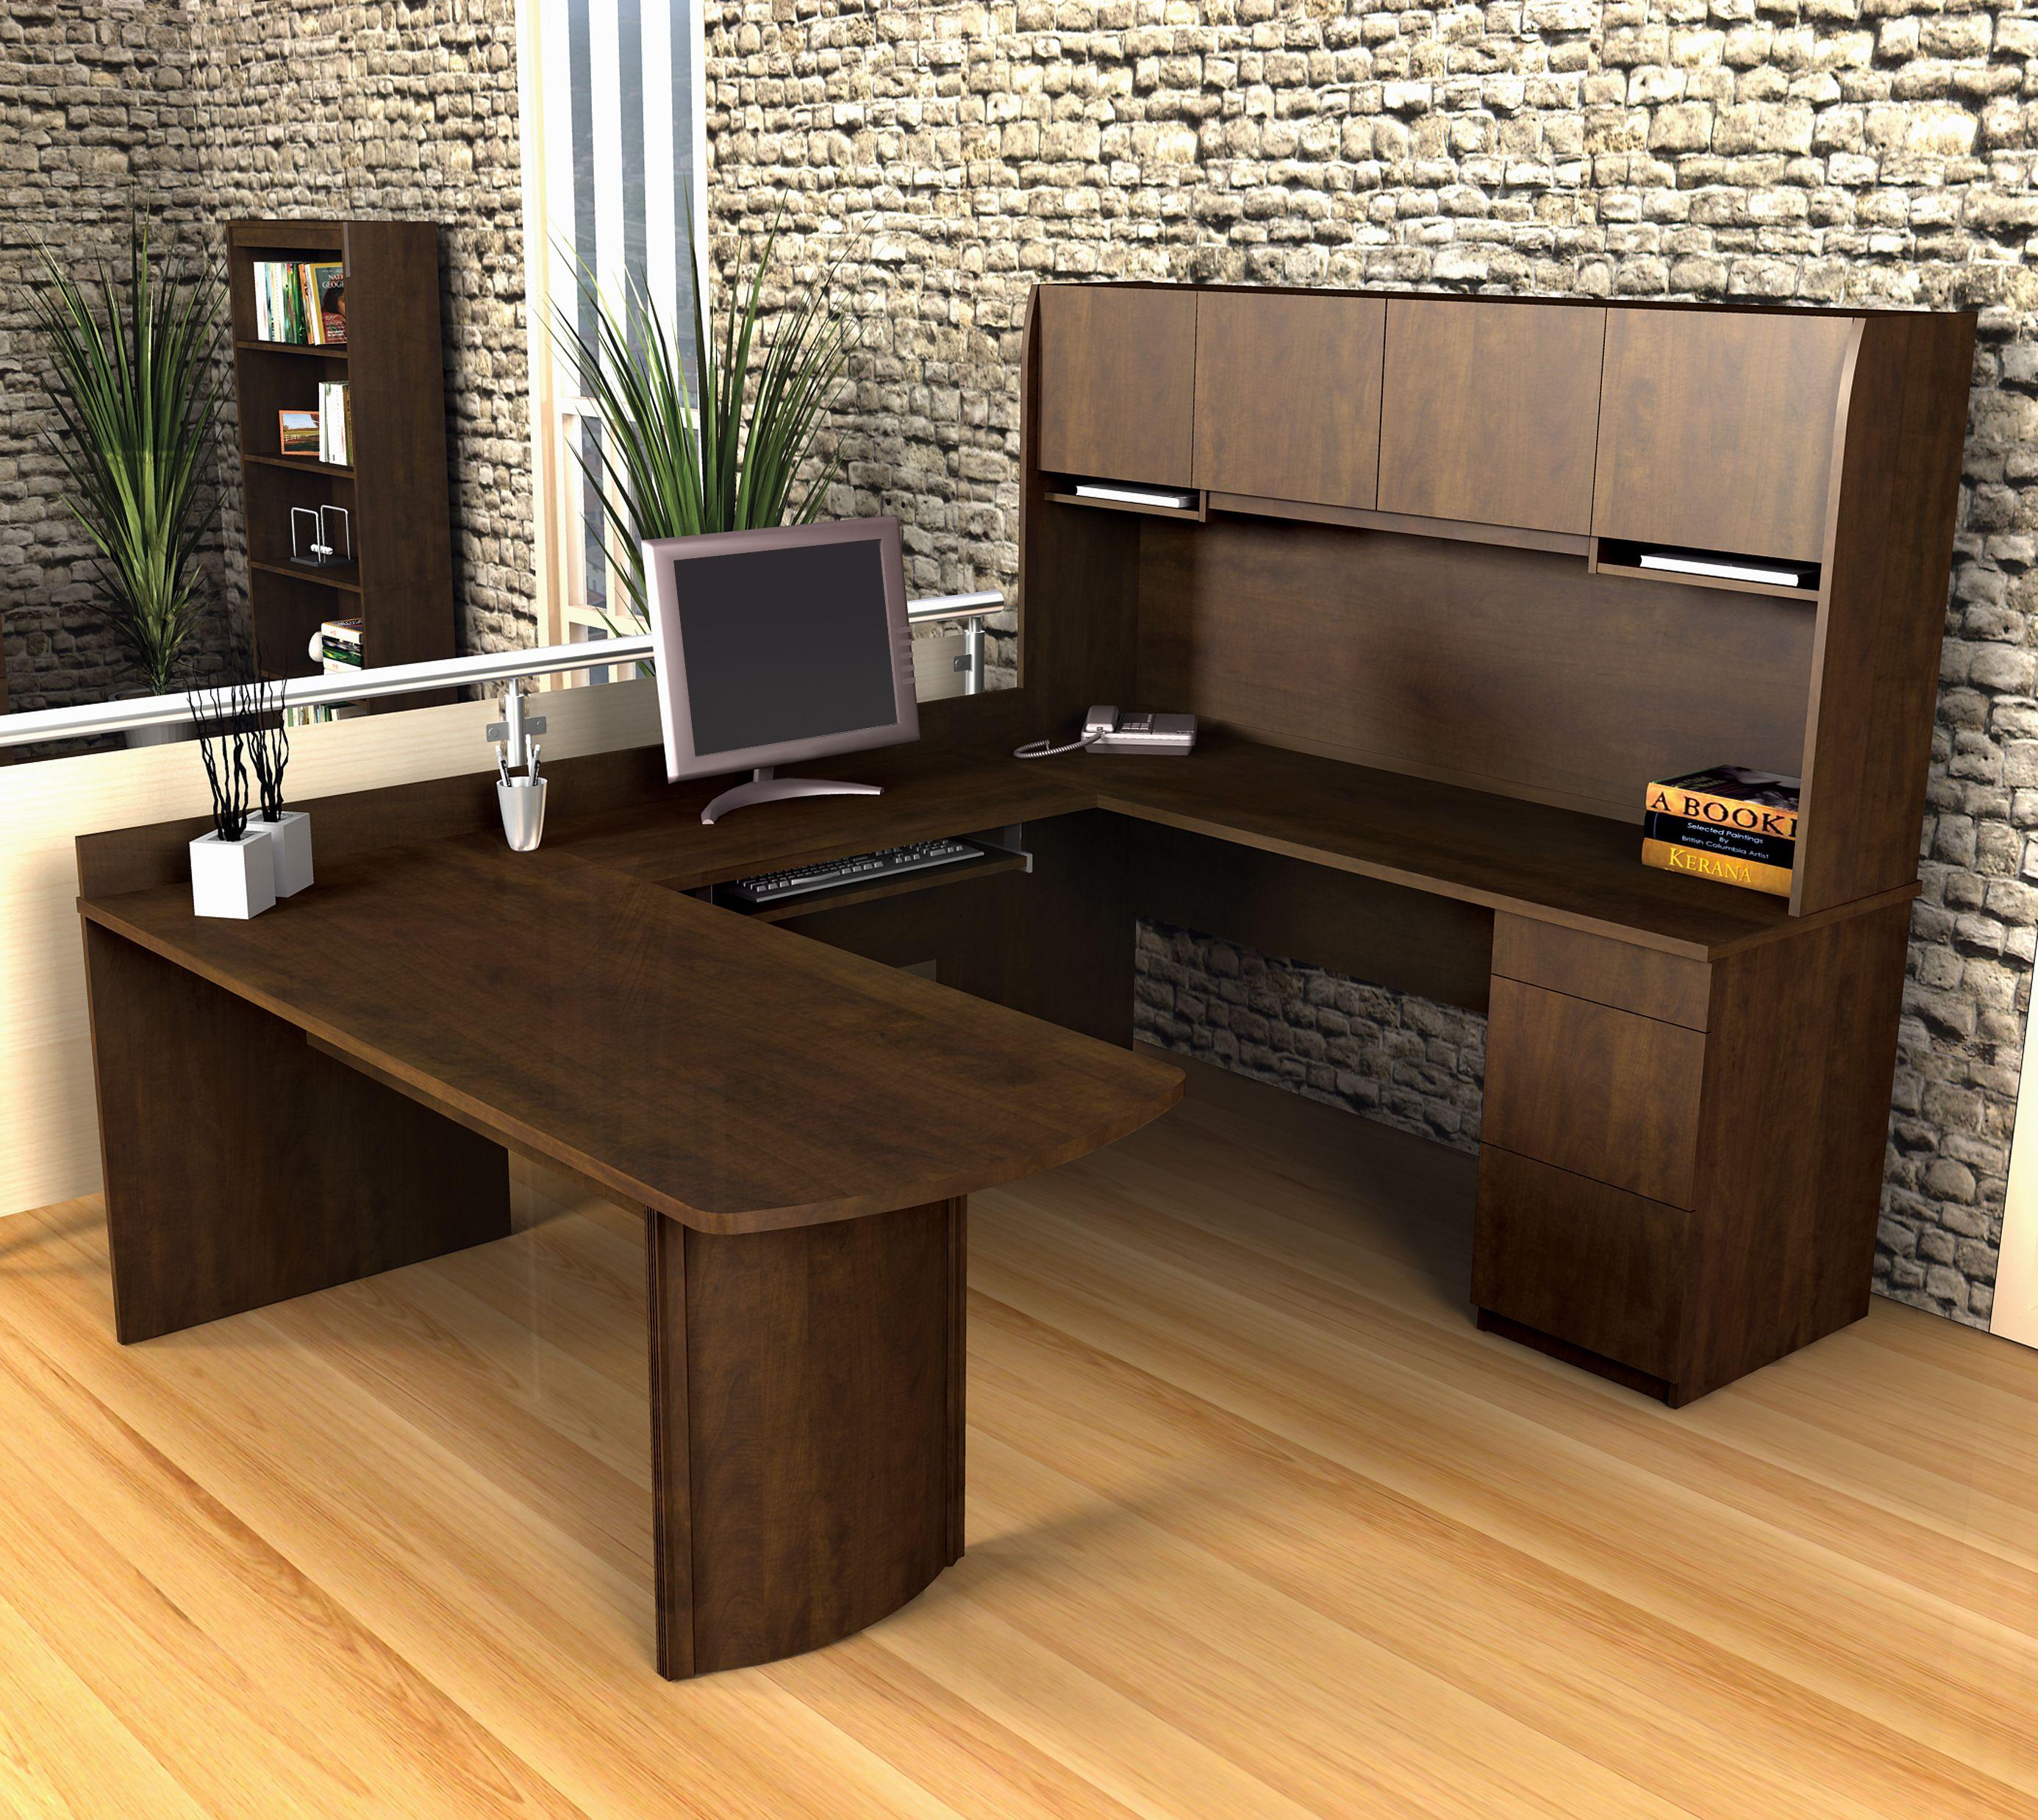 Create A Home Office Area With U Shaped Desk Desk Layout Home Office Furniture Office Furniture Design